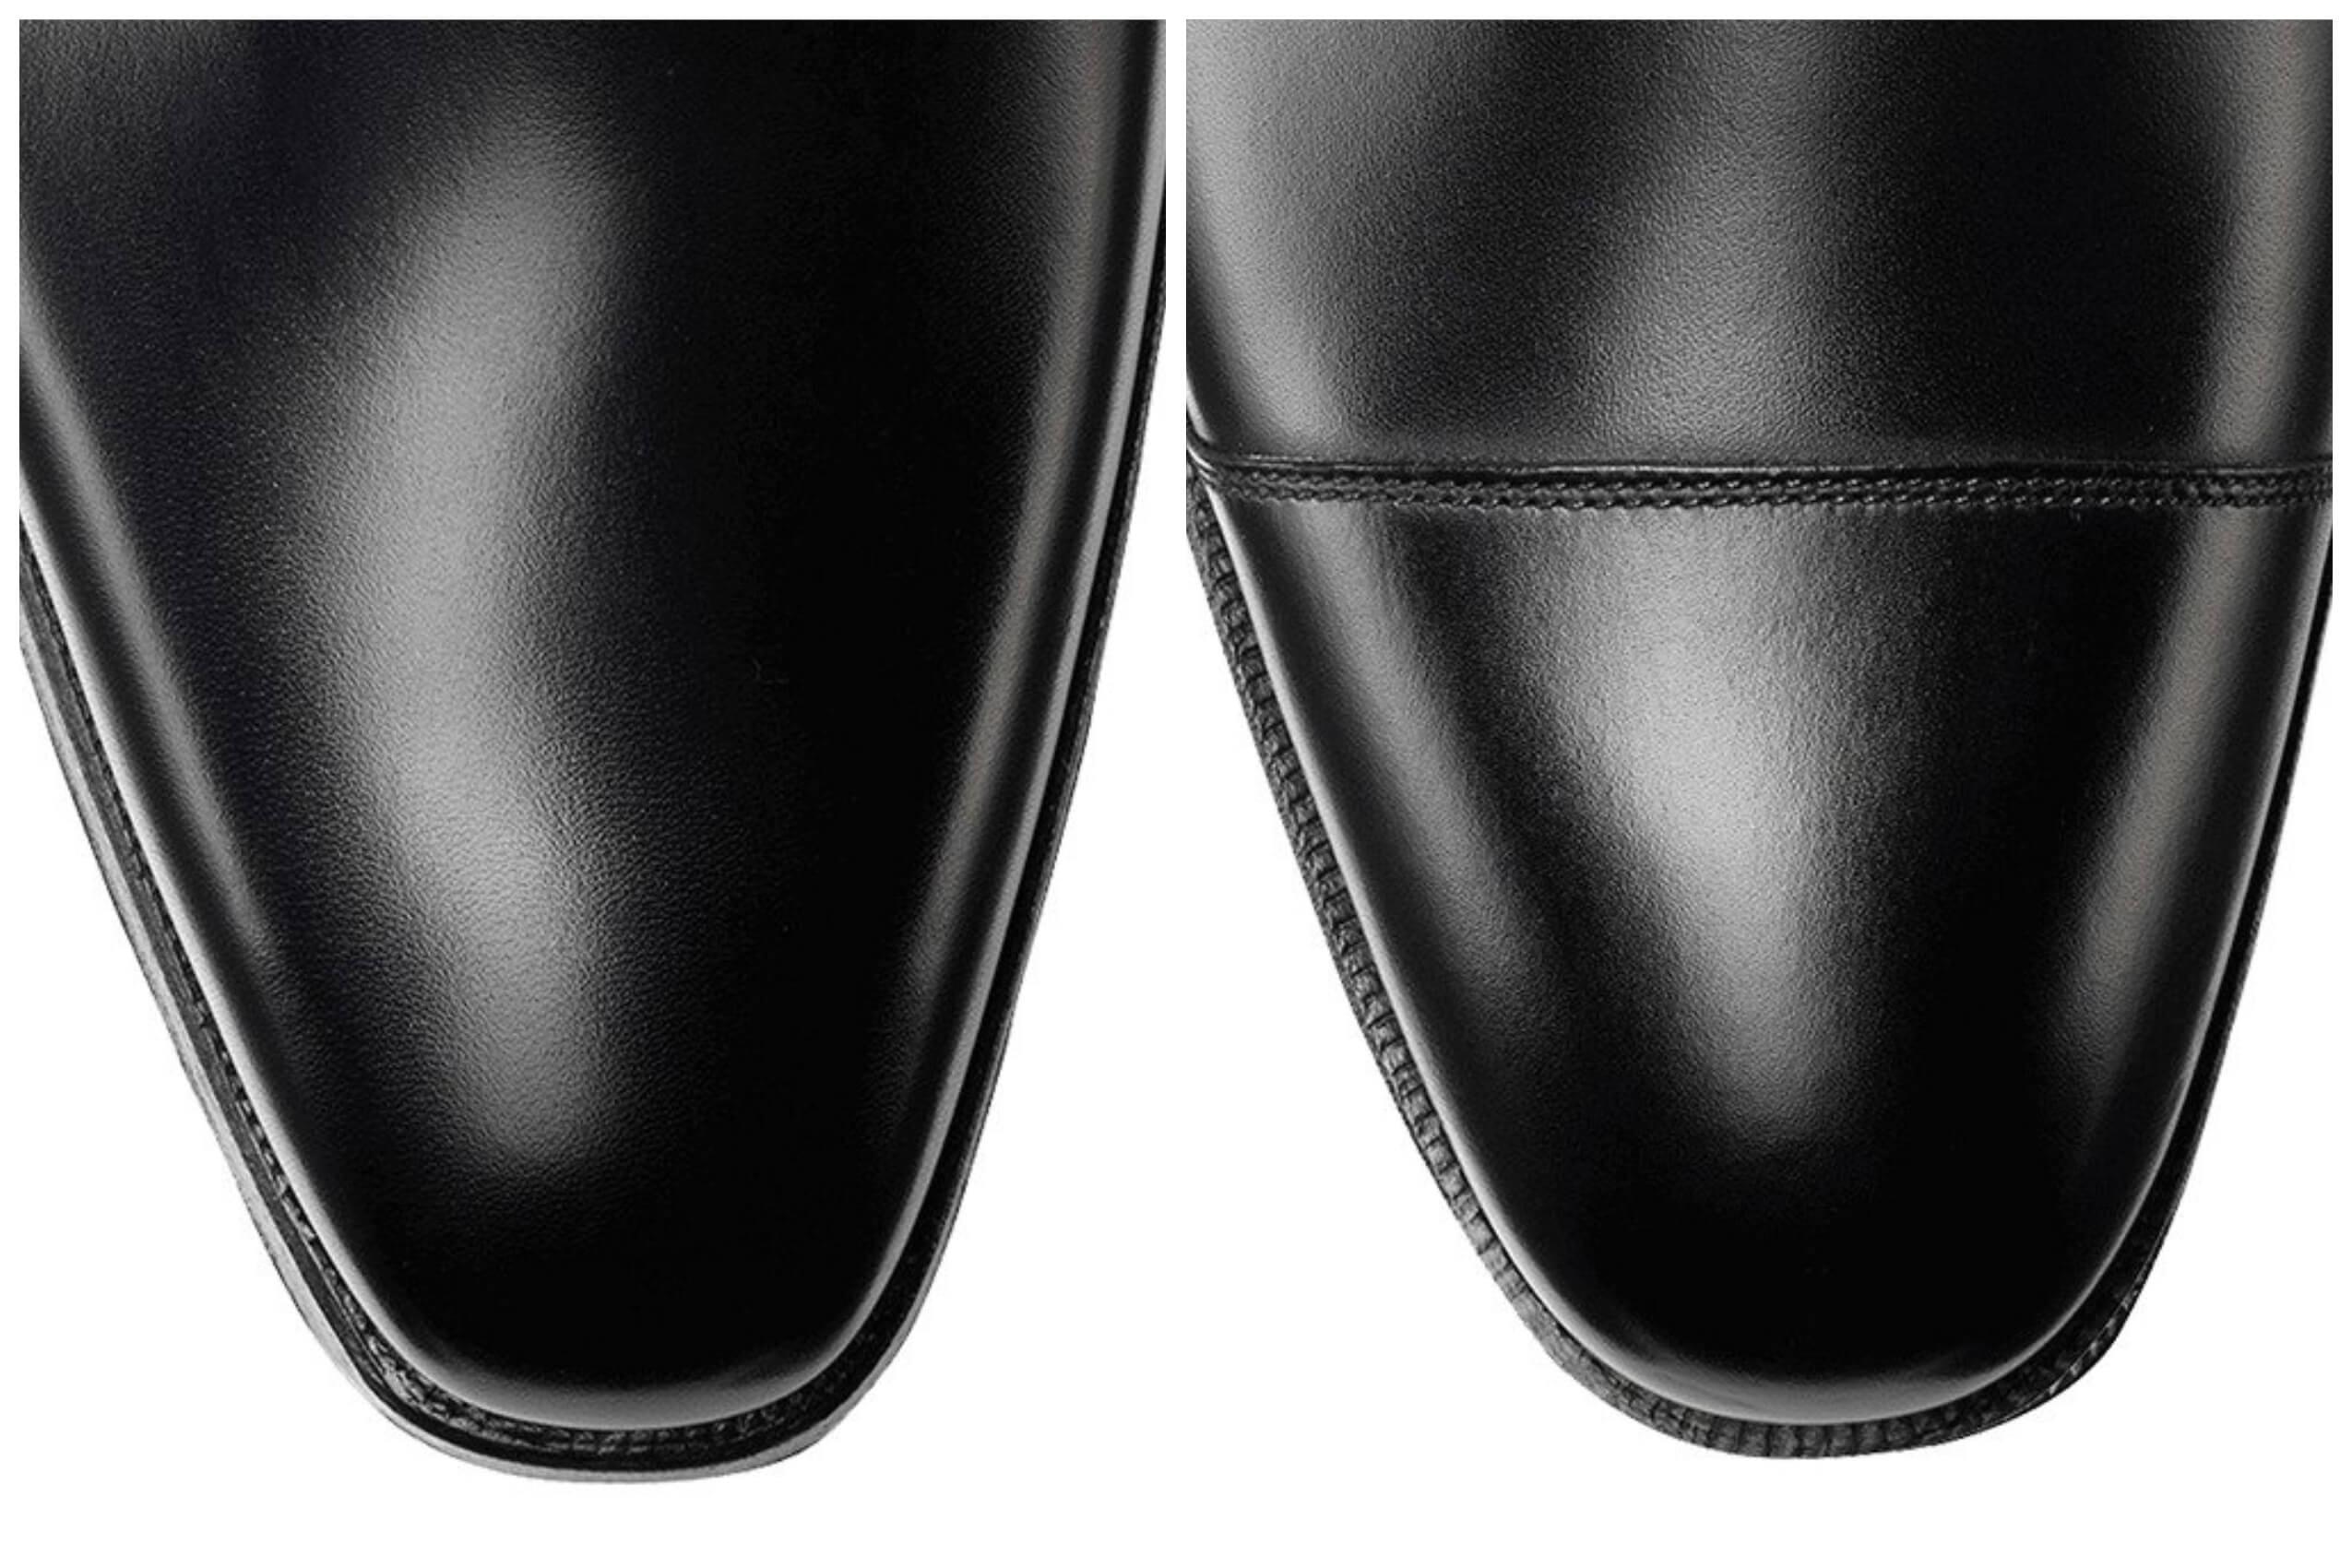 Shoe Toe Shapes and Detailing Explained